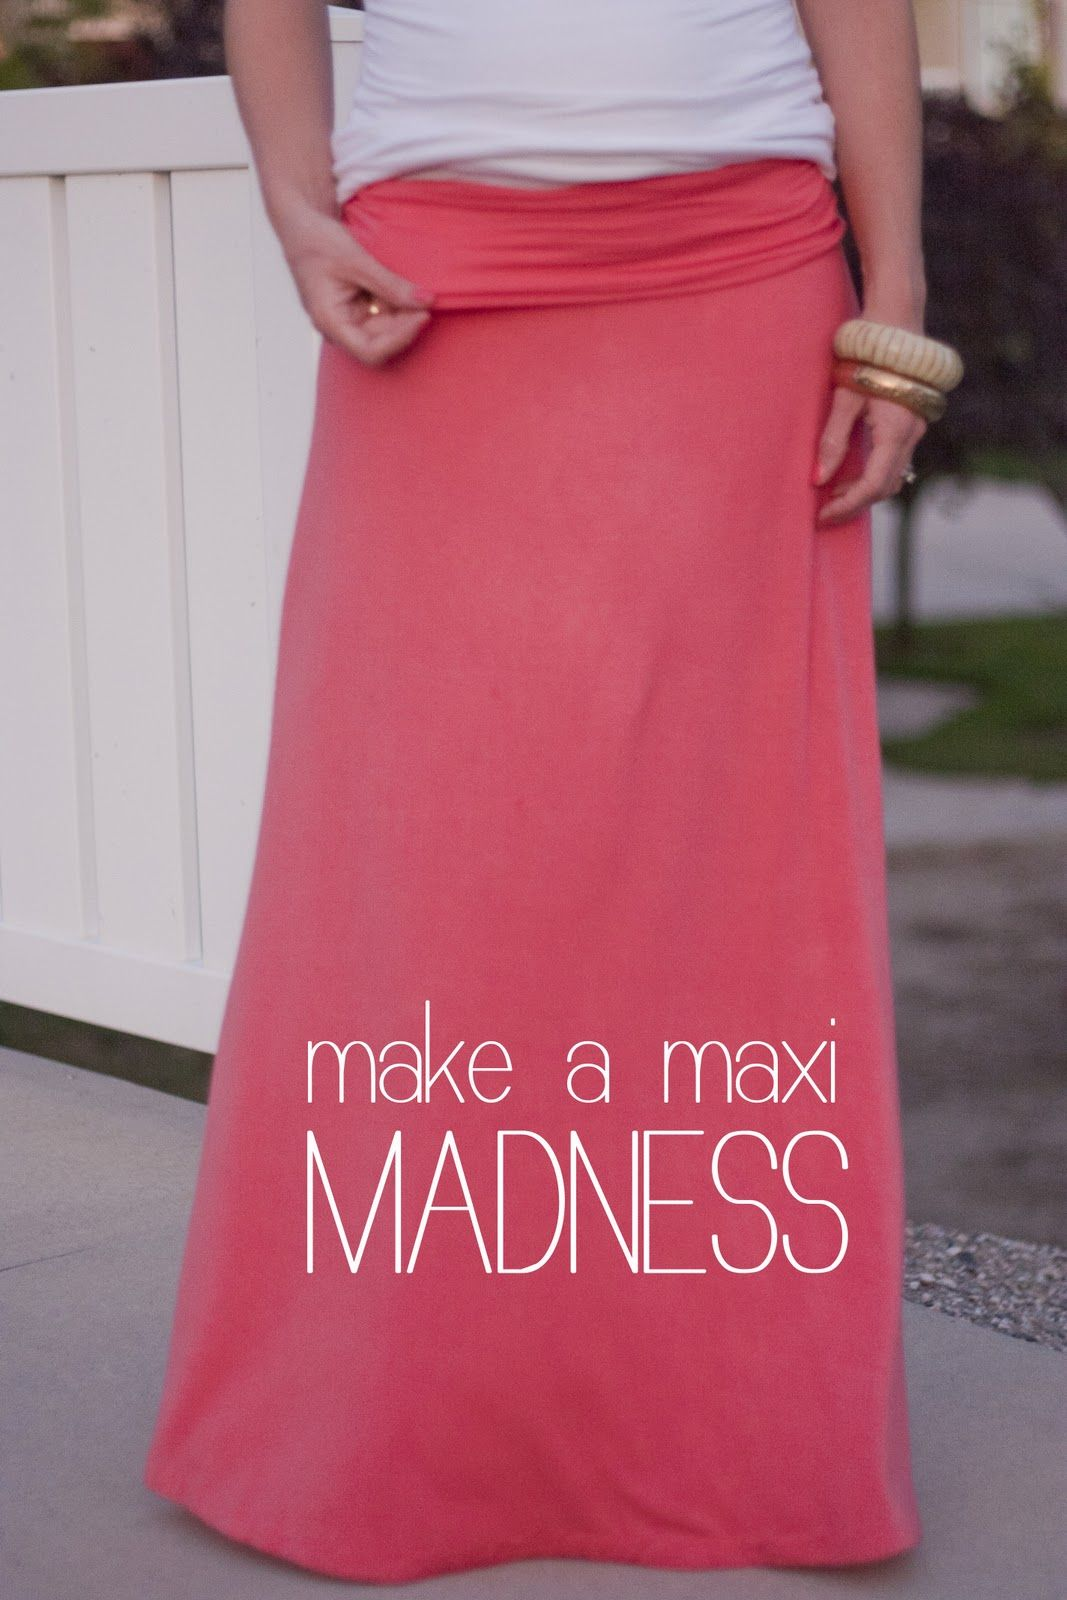 Elle Apparel: Make a Maxi Madness